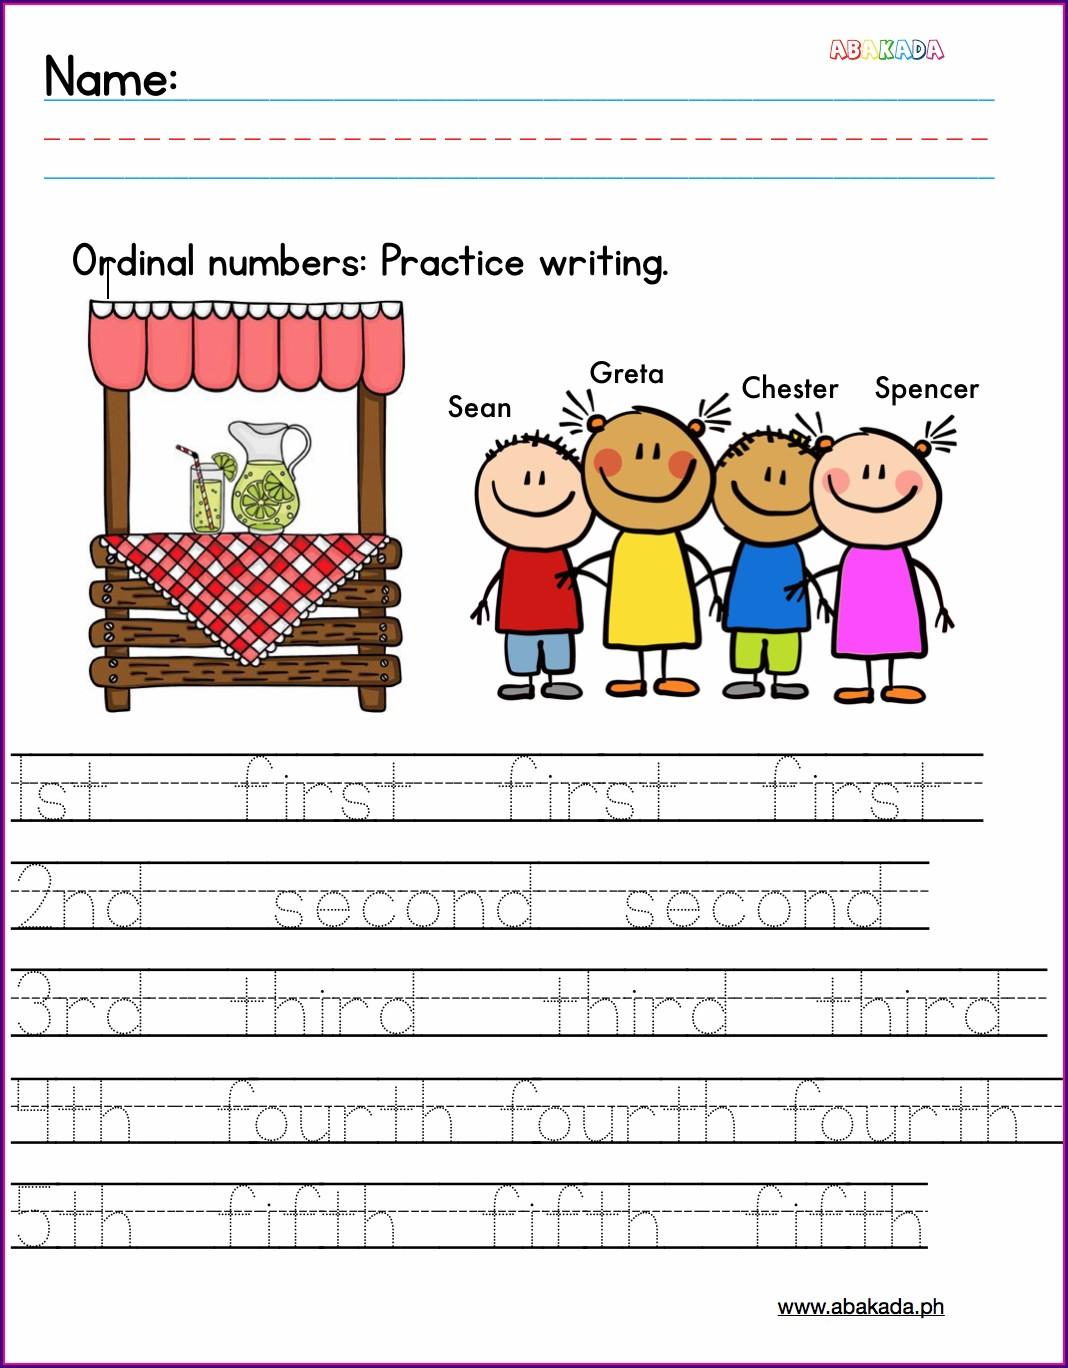 5th Grade Science Cst Practice Worksheets Worksheet